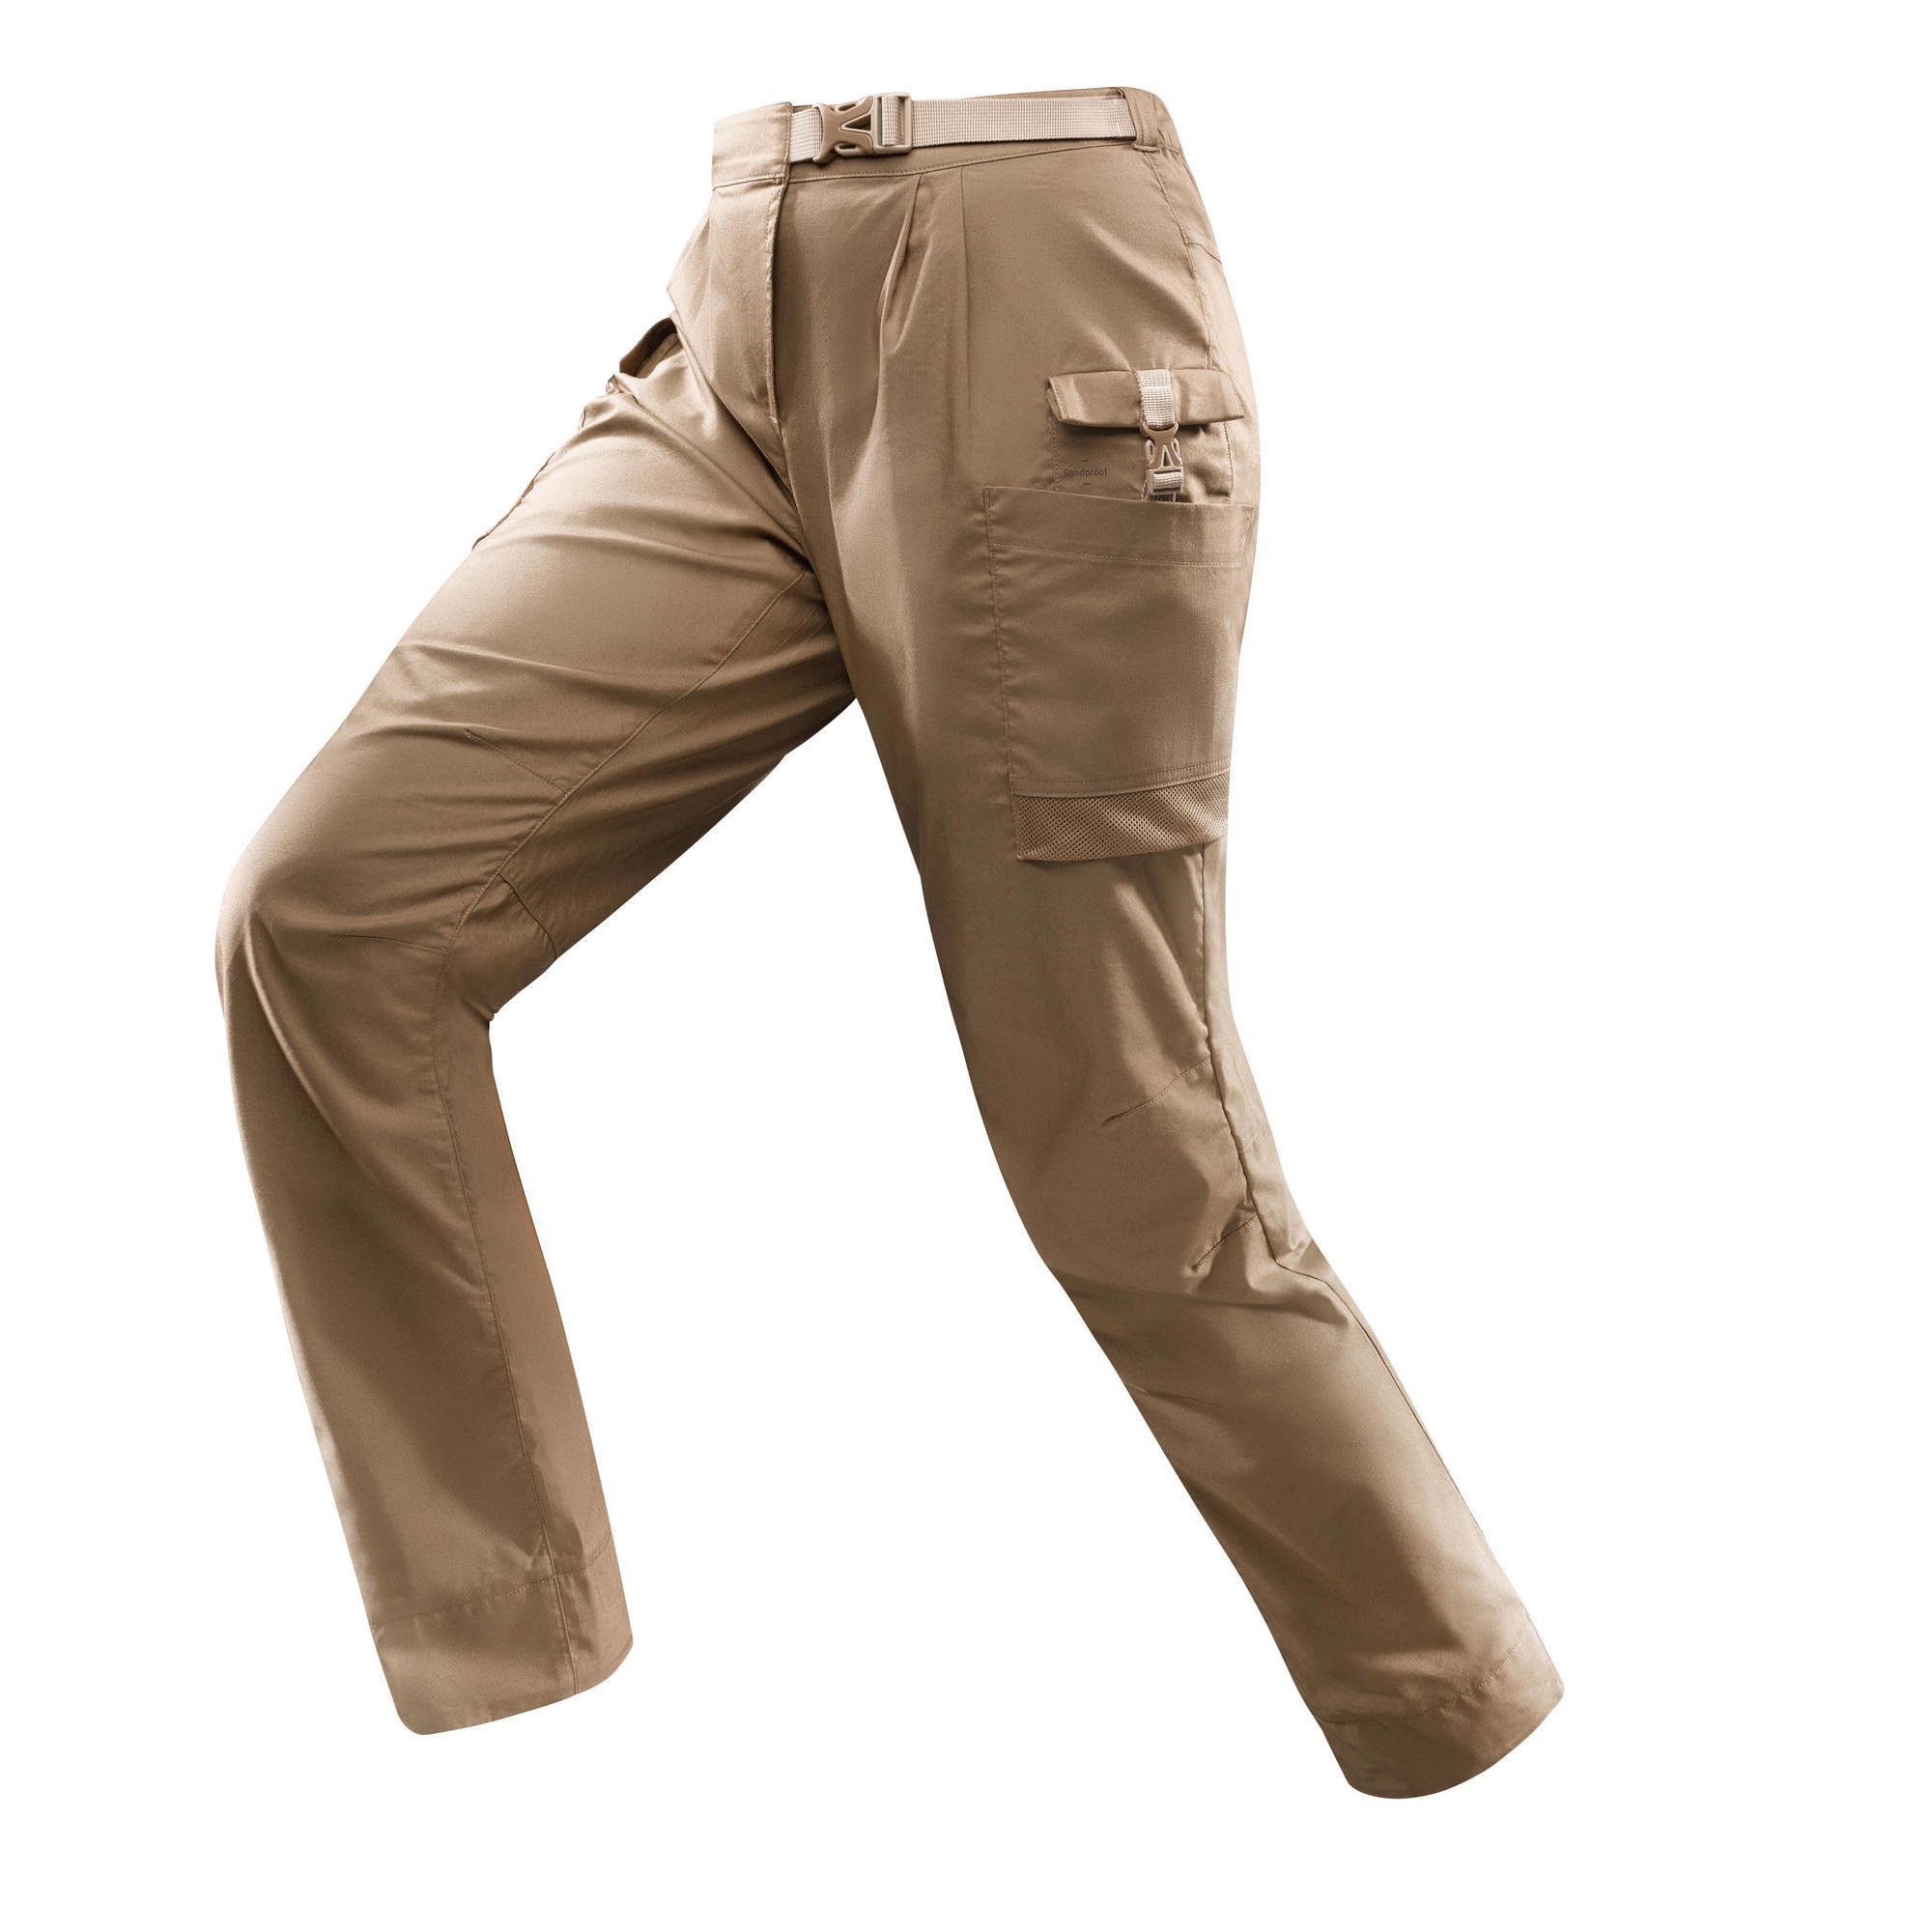 Trekkinghose Desert 500 Damen braun | Sportbekleidung > Sporthosen > Trekkinghosen | Forclaz